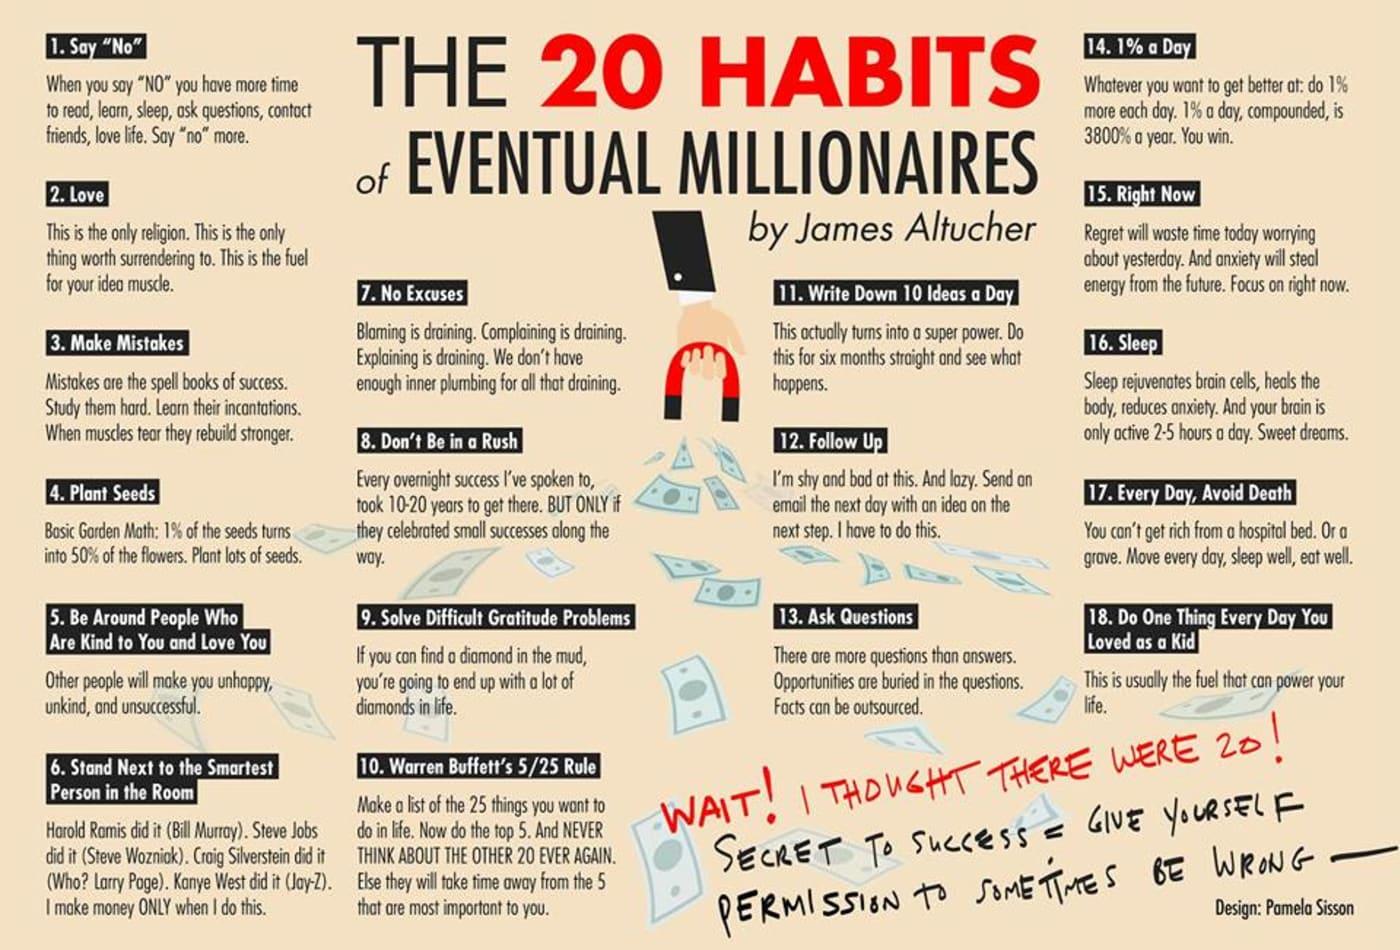 The 20 habits of eventual millionaires